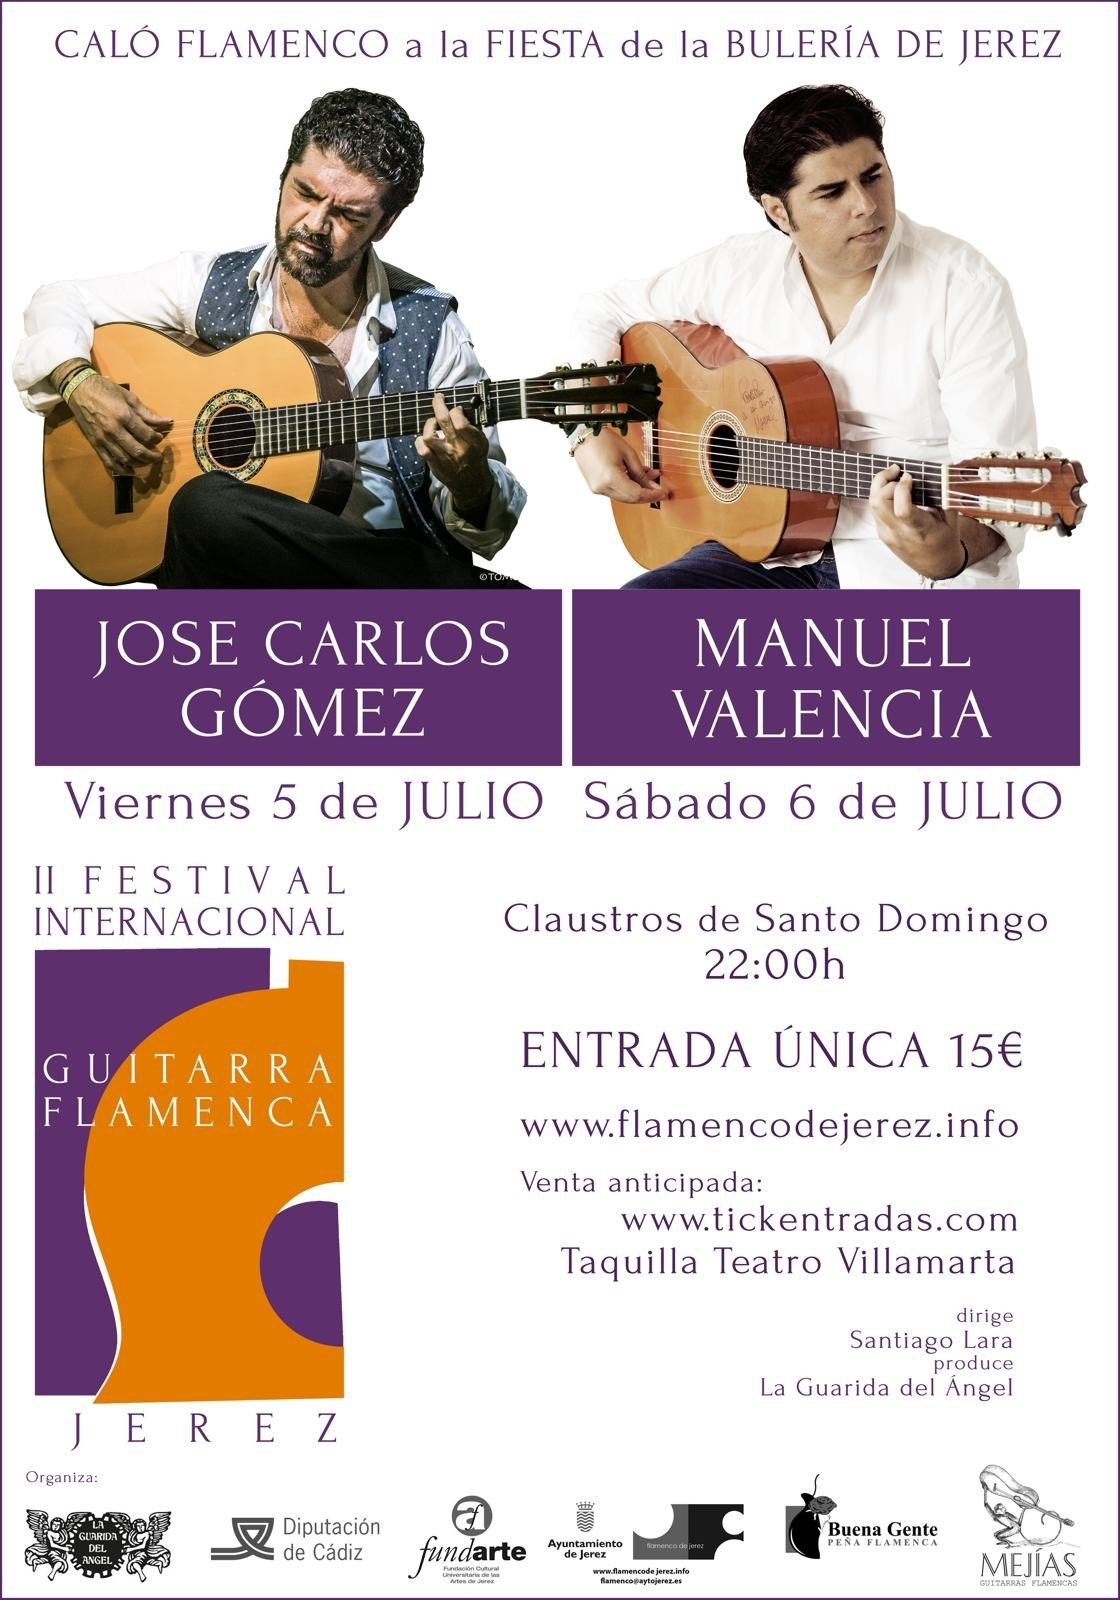 Festival Internacional de Guitarra Flamenca